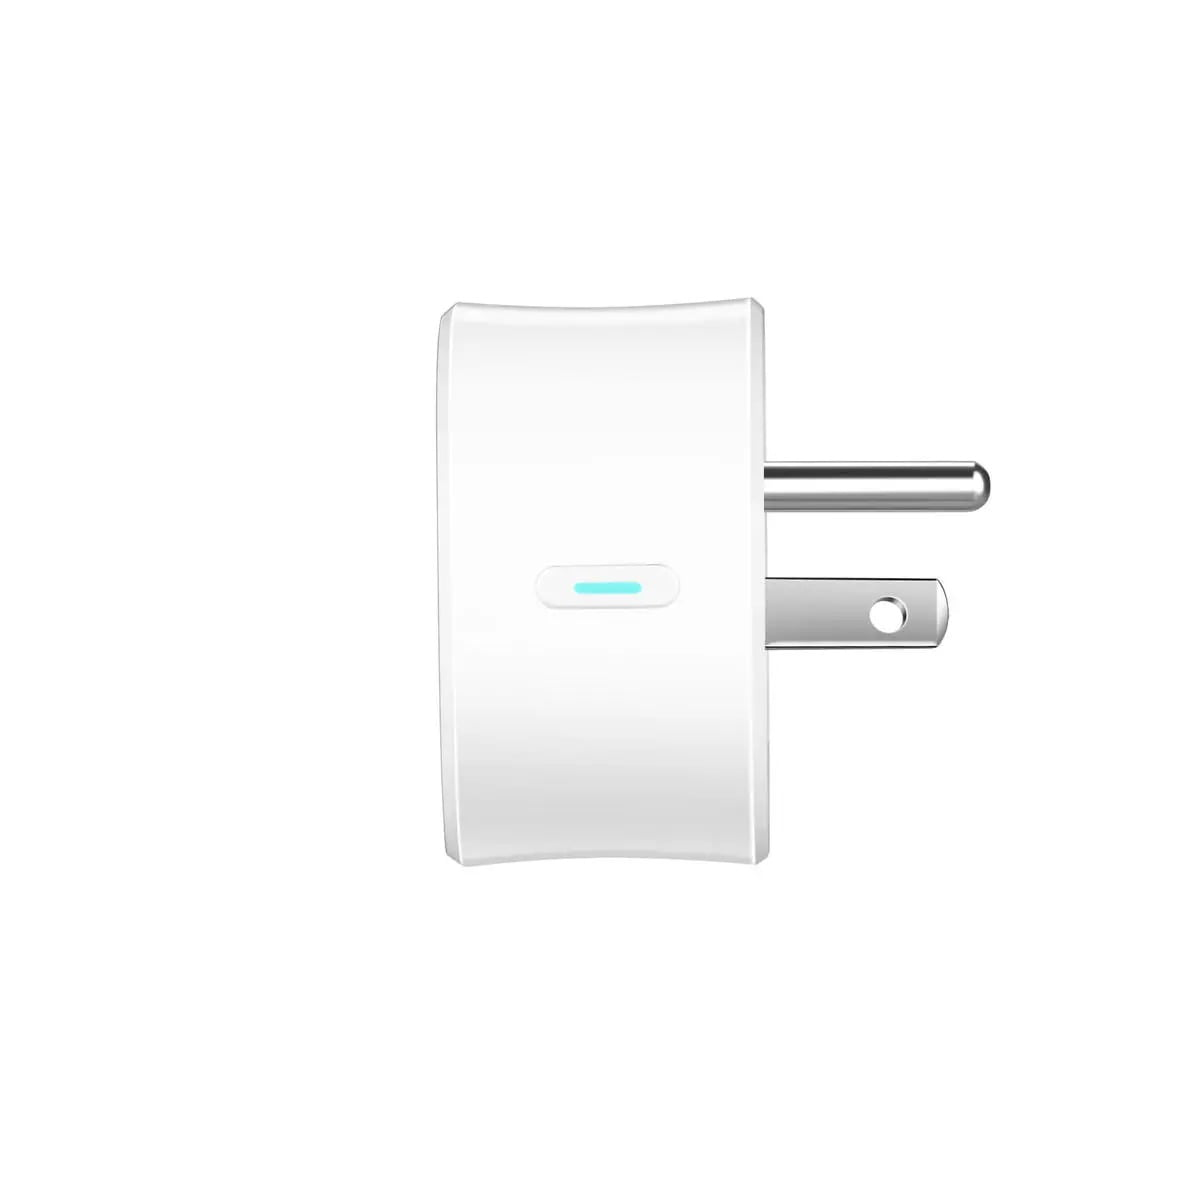 SP11 10A WiFi Smart Plug Socket Switch US Plug Remote control Power Strip Timing (11)